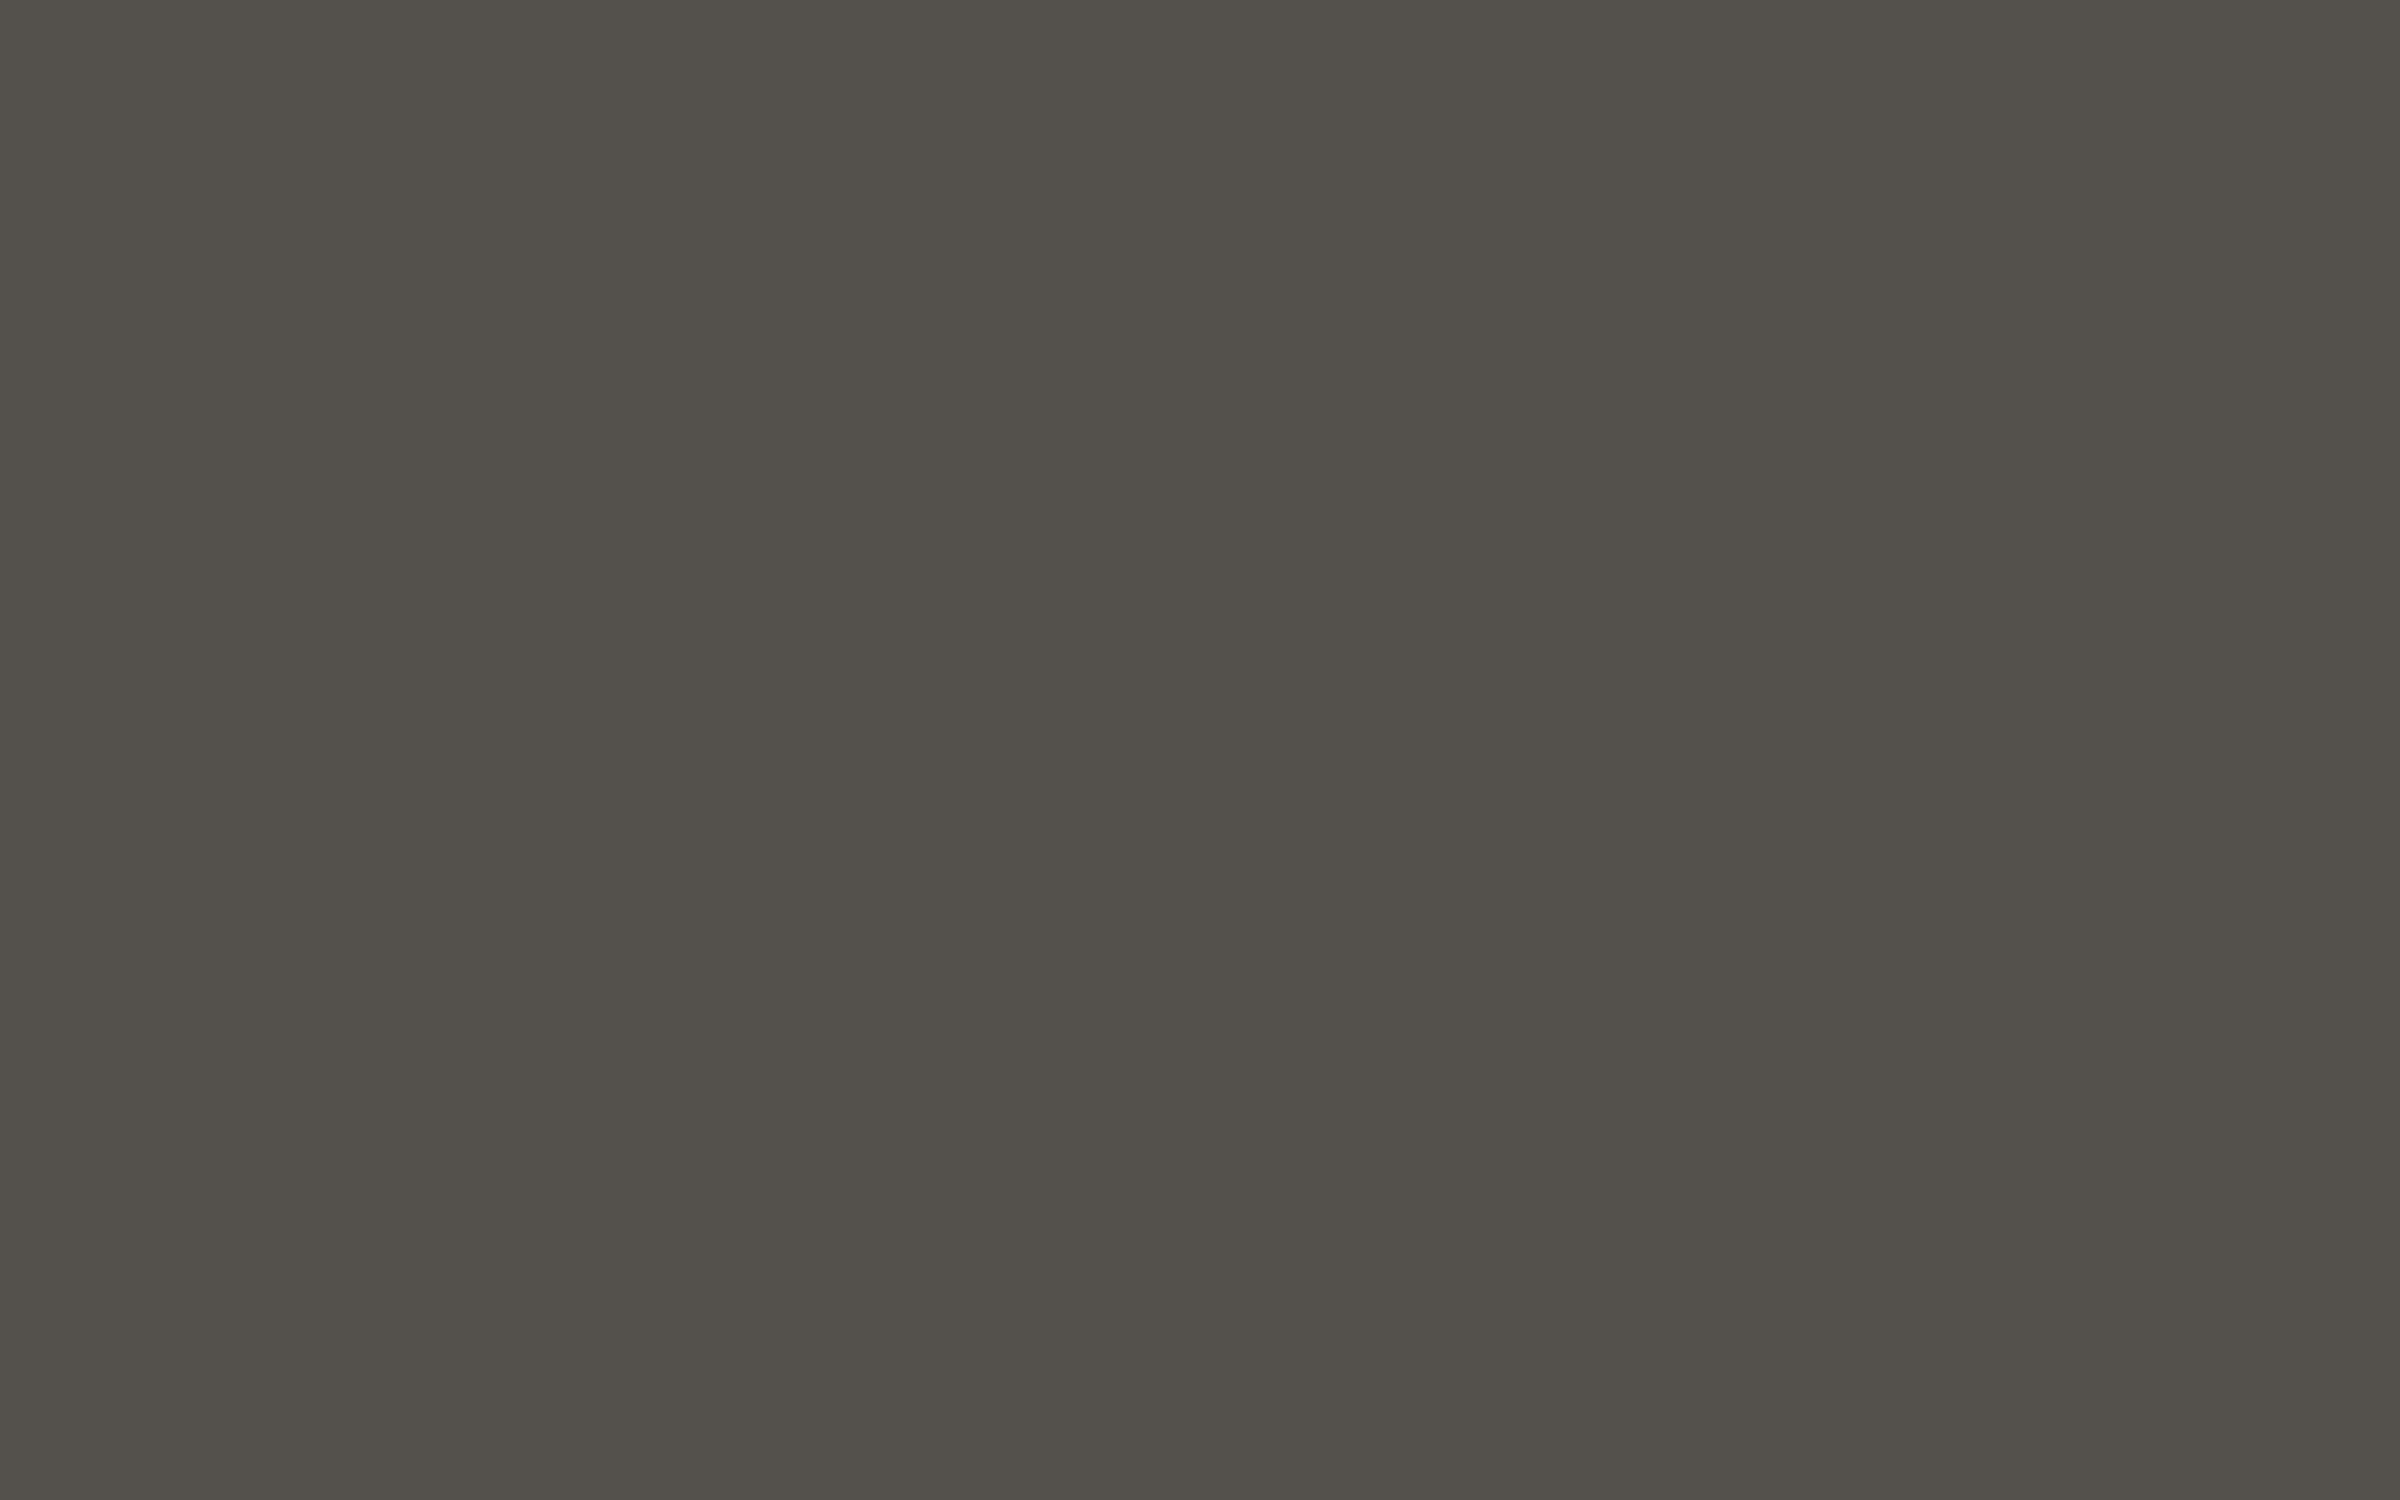 D91 Slate Grey Laminate Countertops